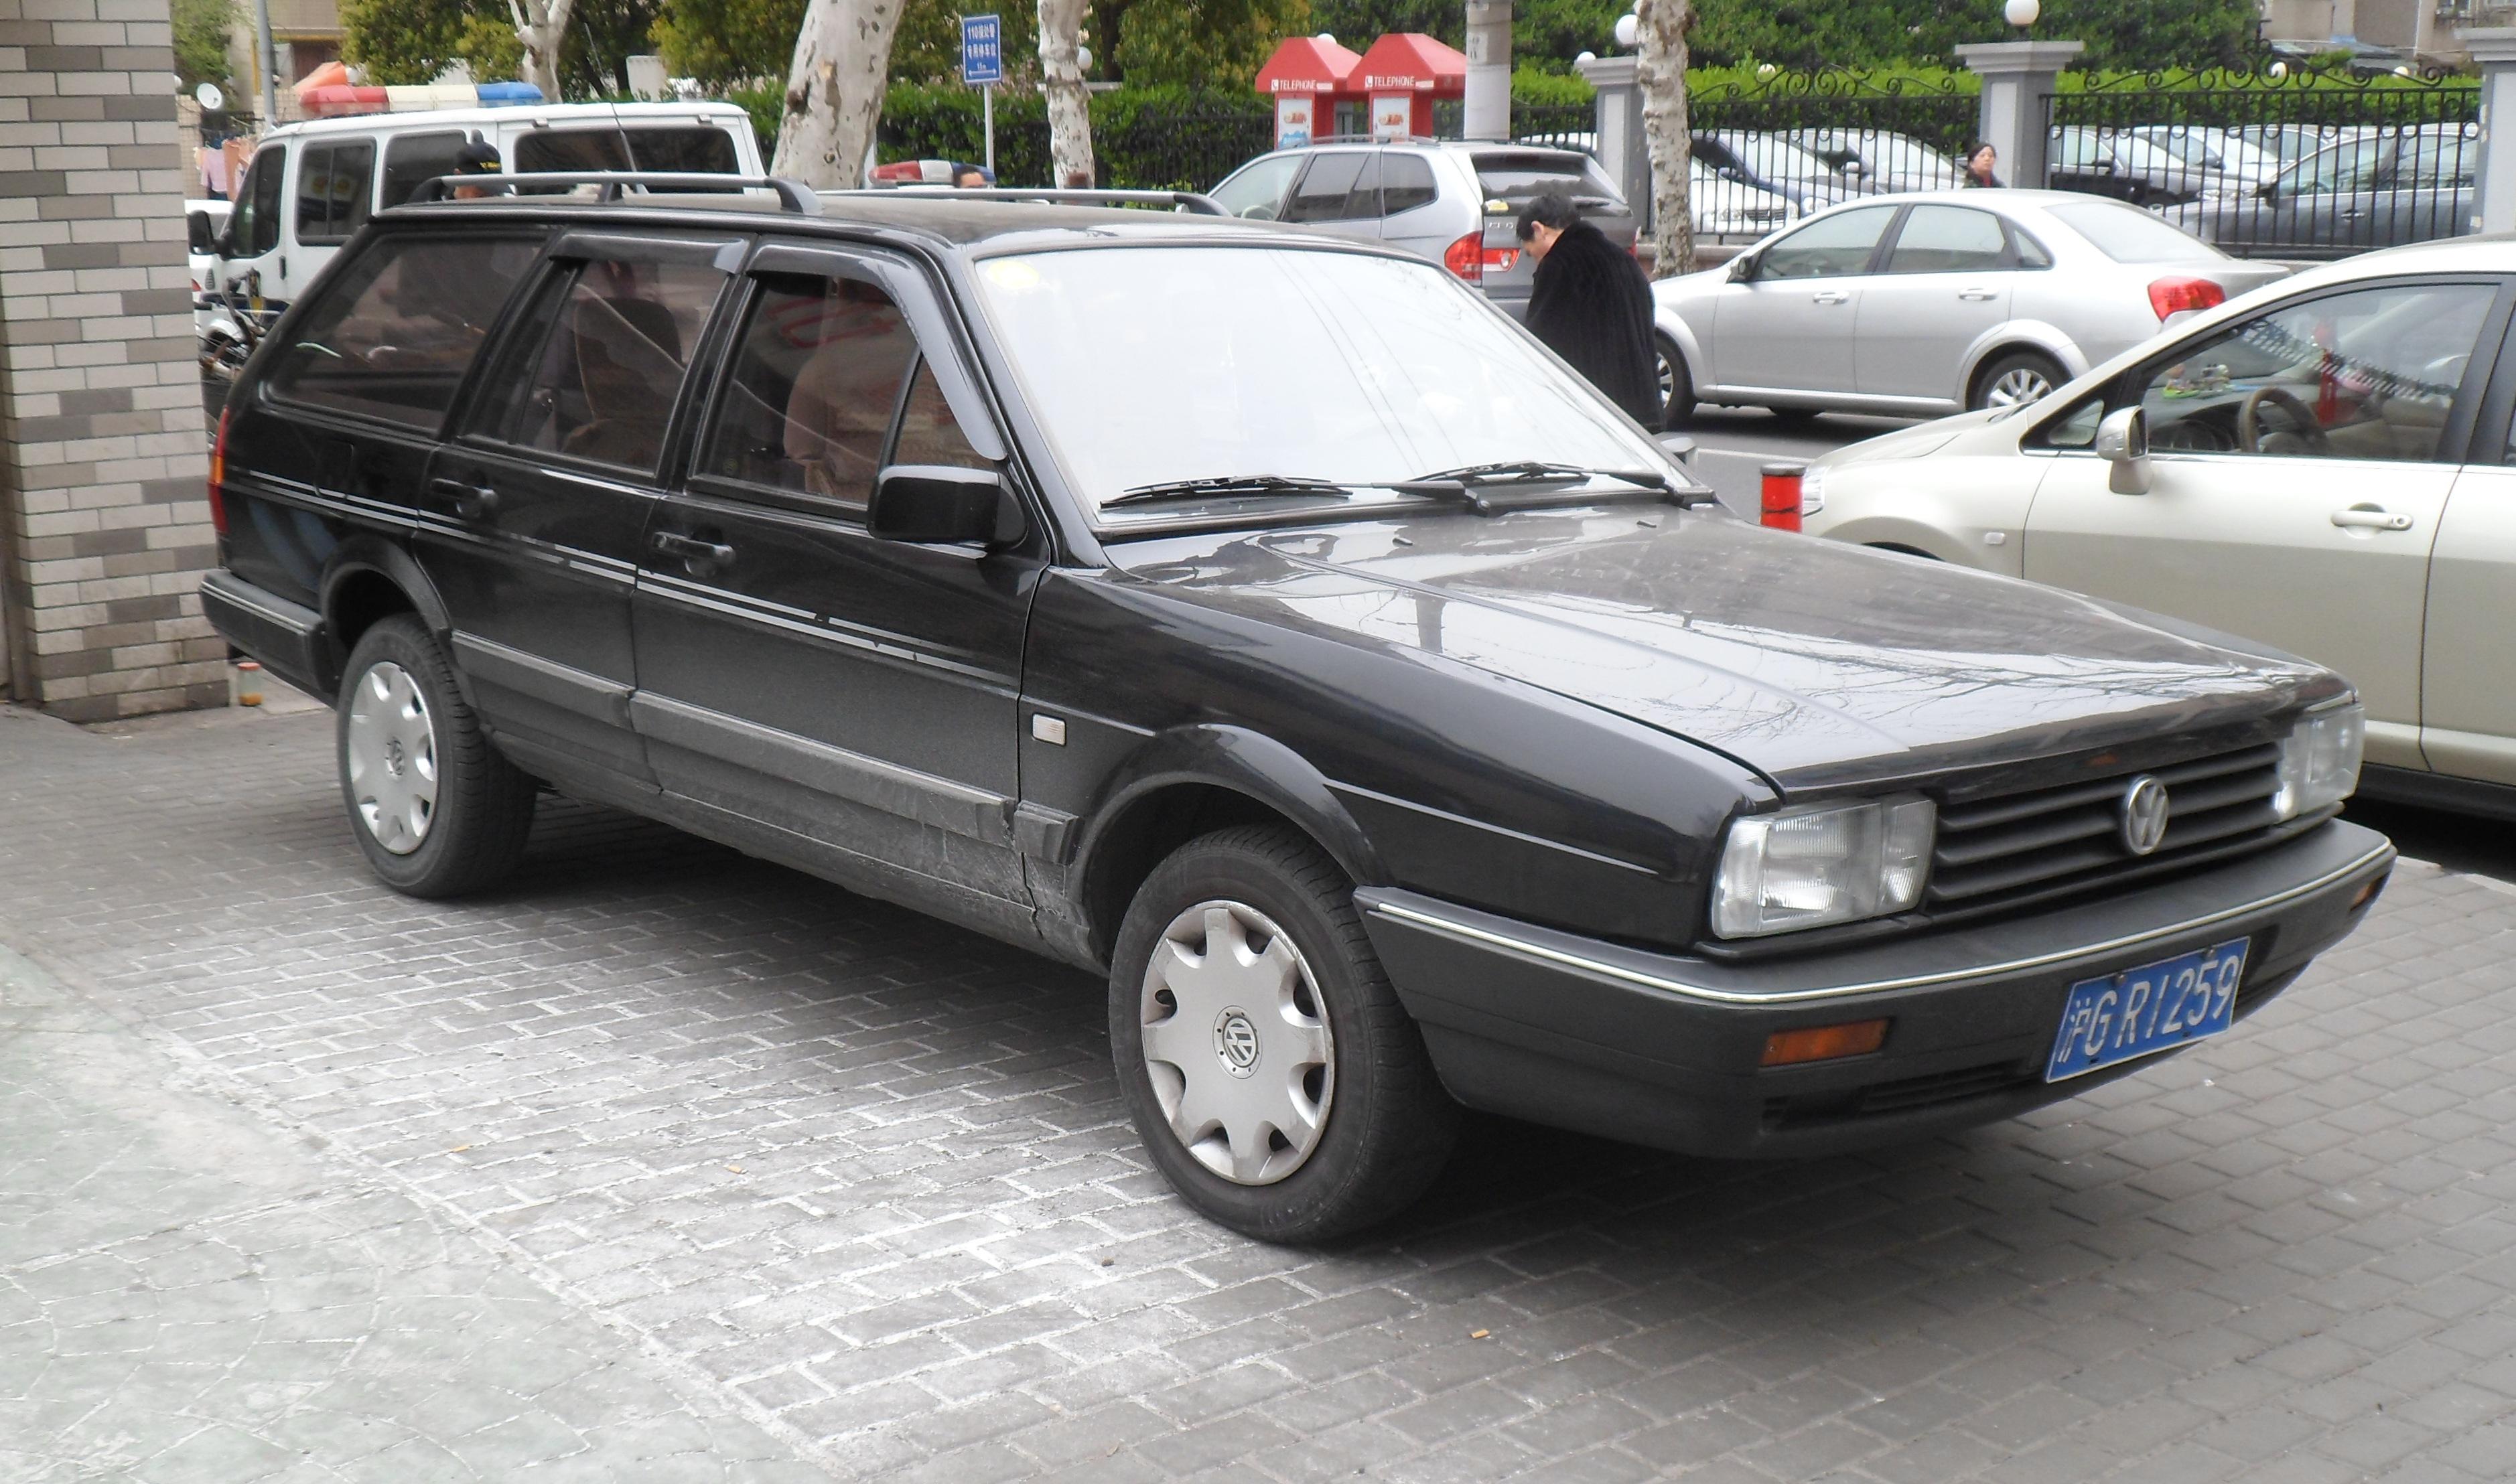 Piece SANTANA : pieces Volkswagen SANTANA moins chères